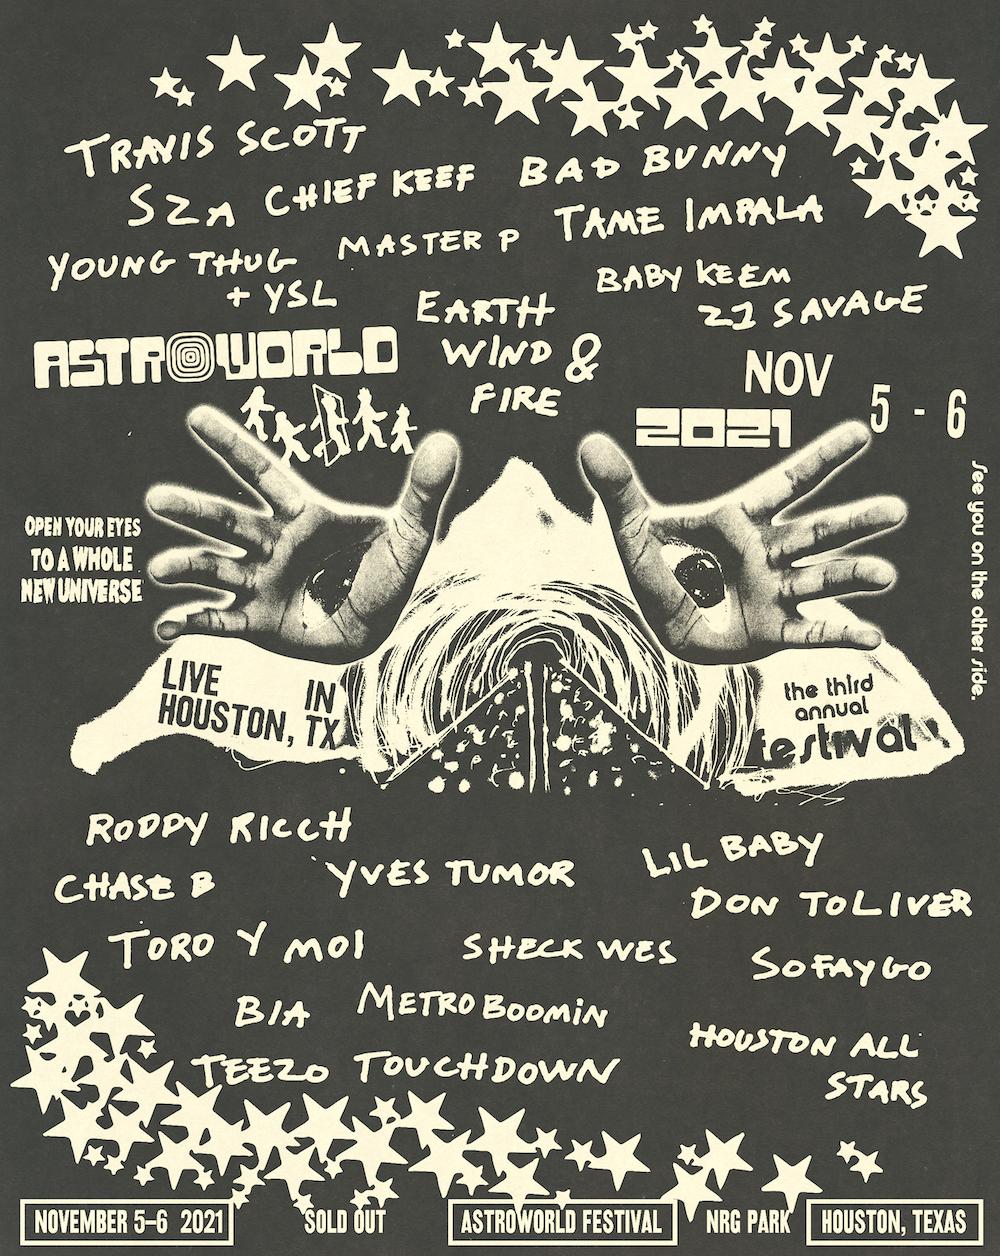 Travis Scott's Astroworld Lineup Announces Tame Impala, Young Thug, Toro Y Moi, & More